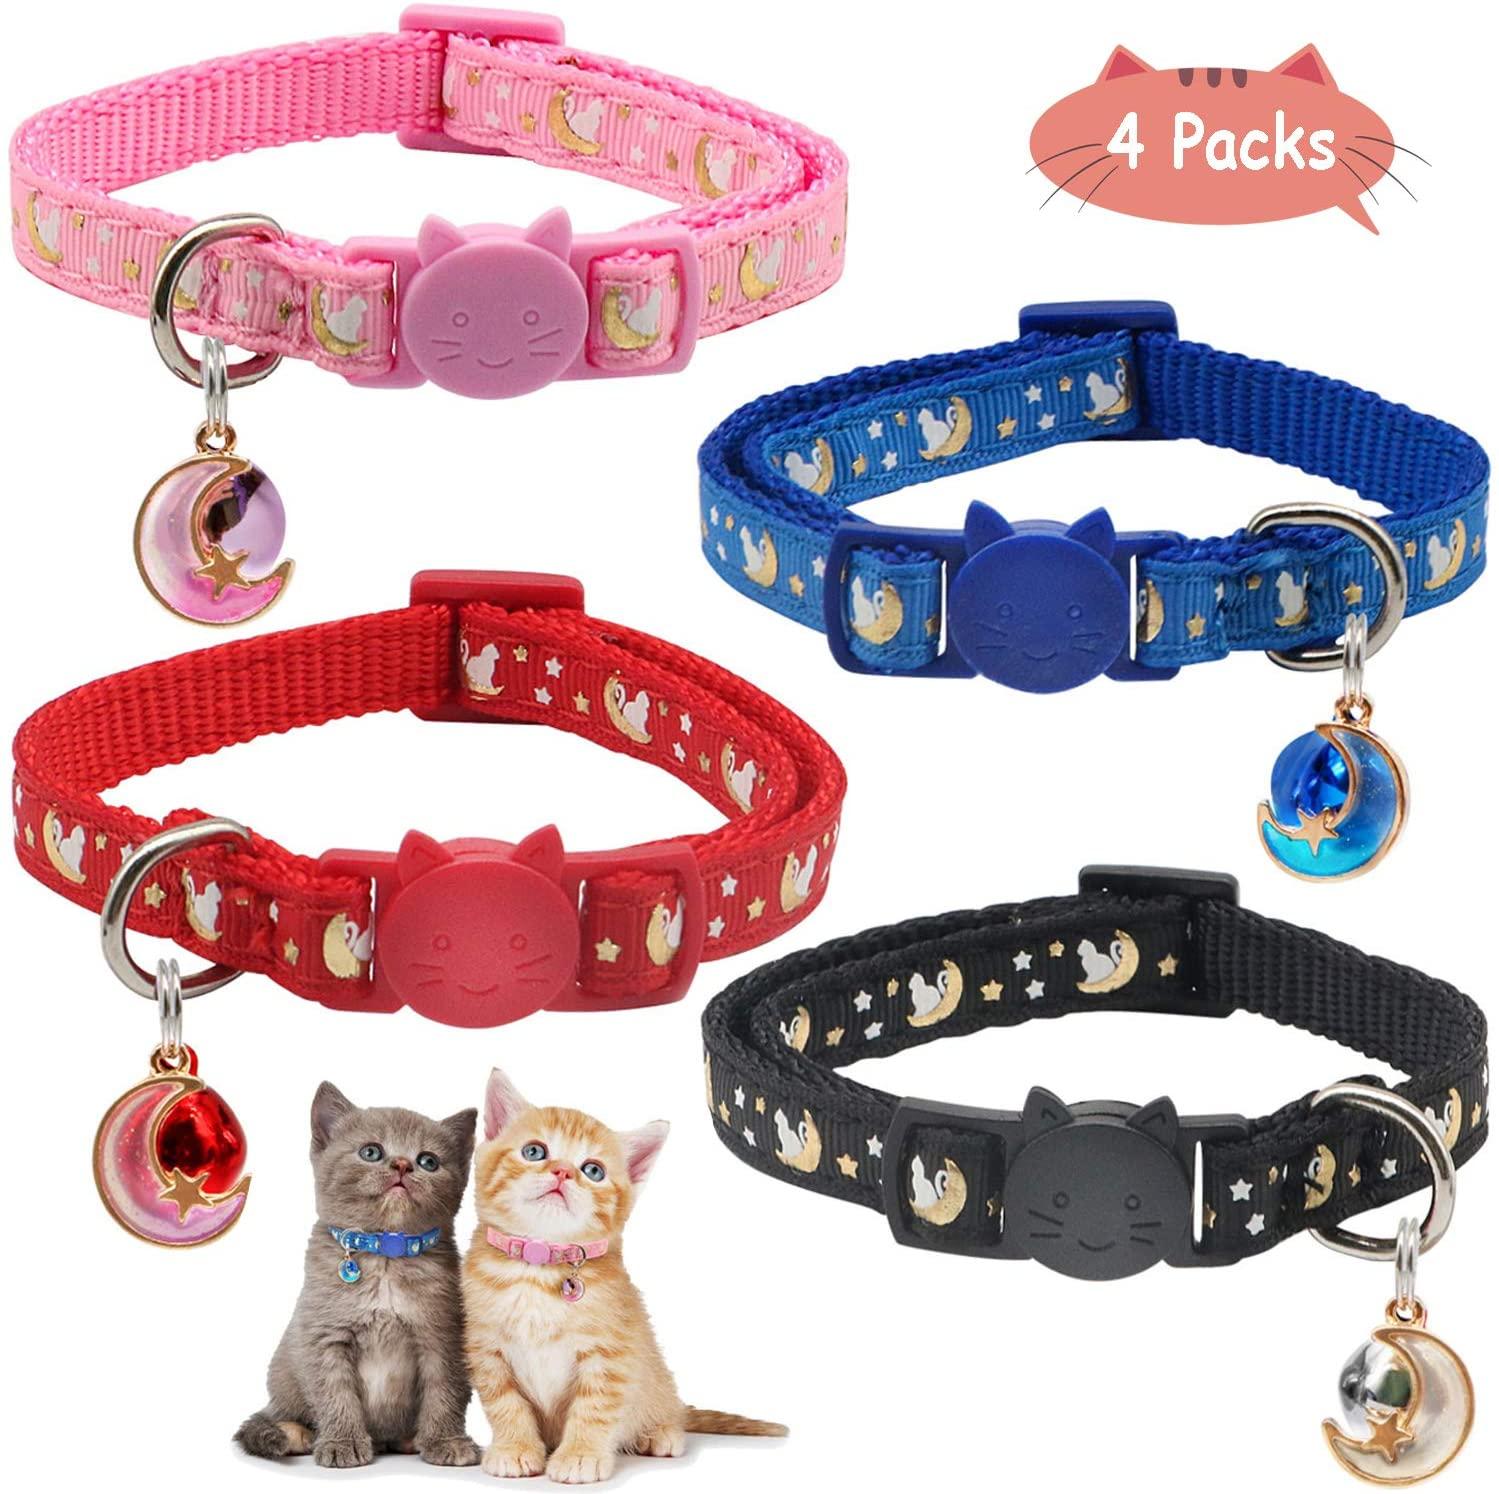 RYPET 4PCS Cat Collars Breakaway with Bell Moons Stars Adjustable Kitten Collar with Pendant Glow in The Dark